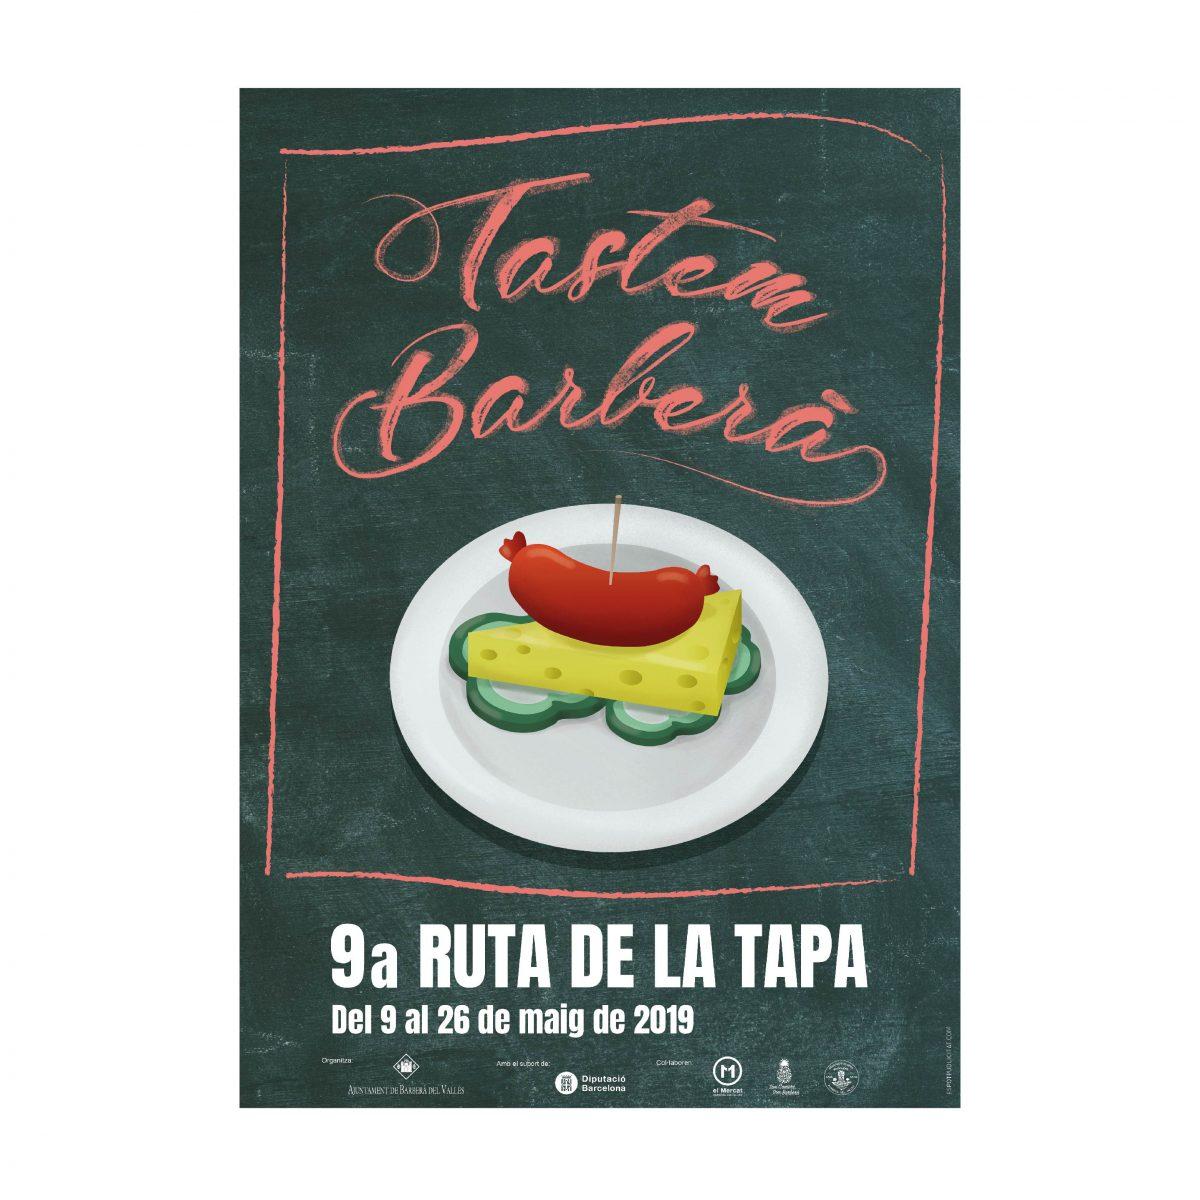 Tastem Barbera